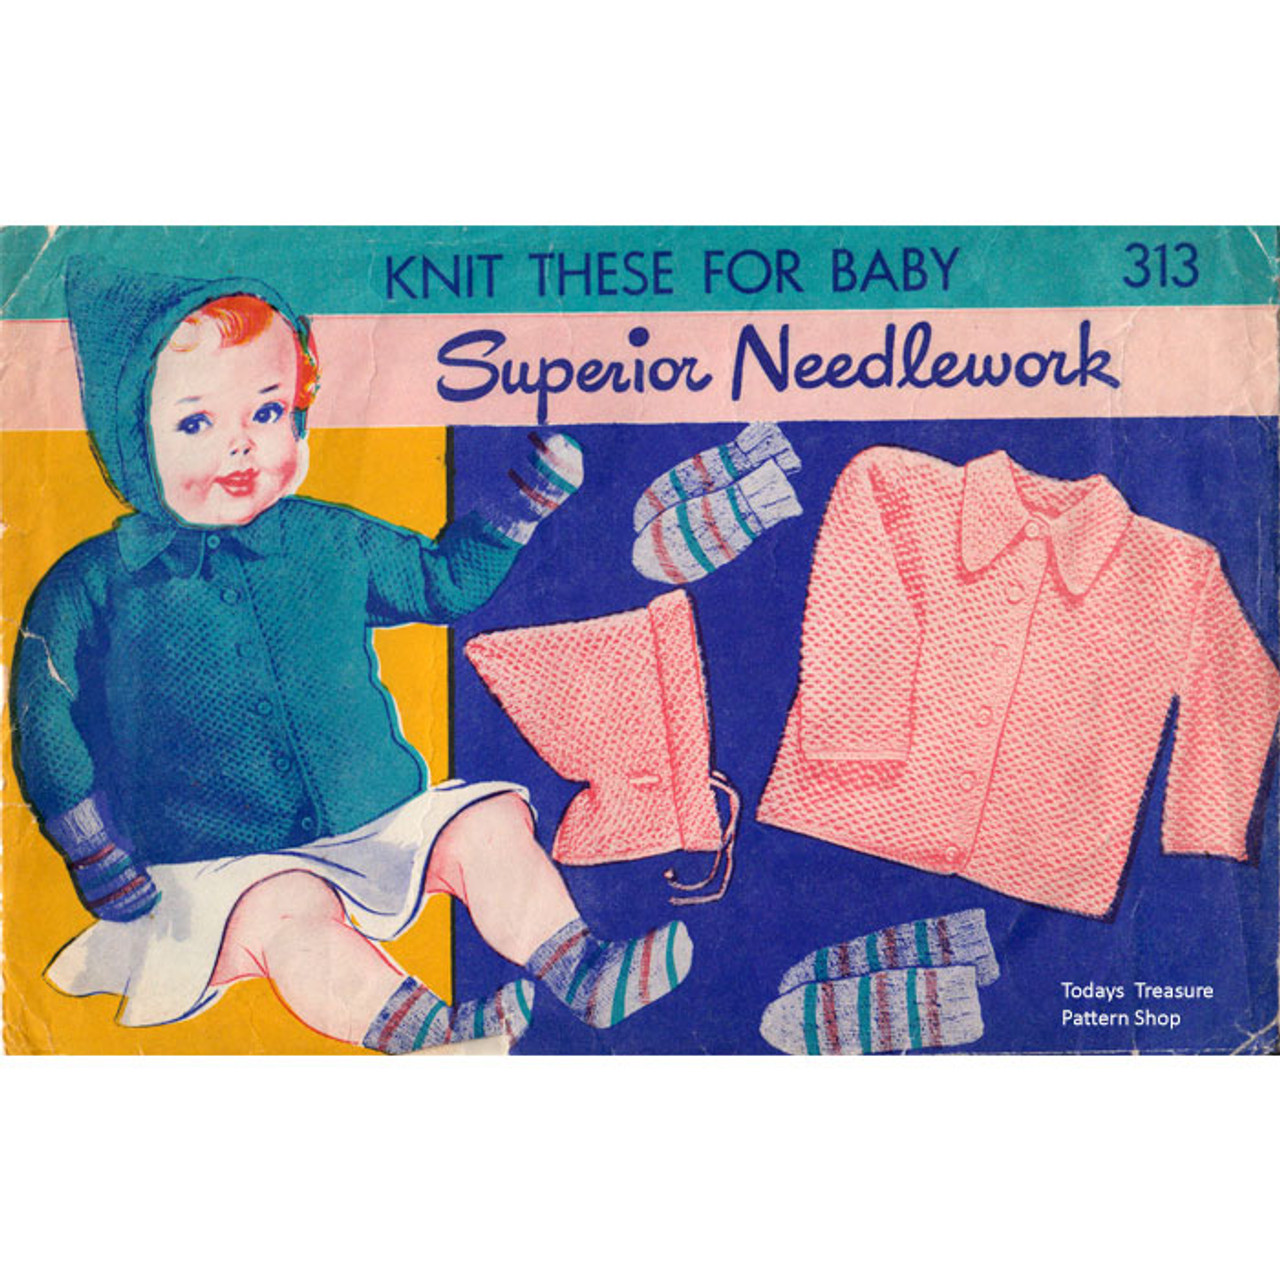 Superior Needlework Knitted Baby Set Pattern